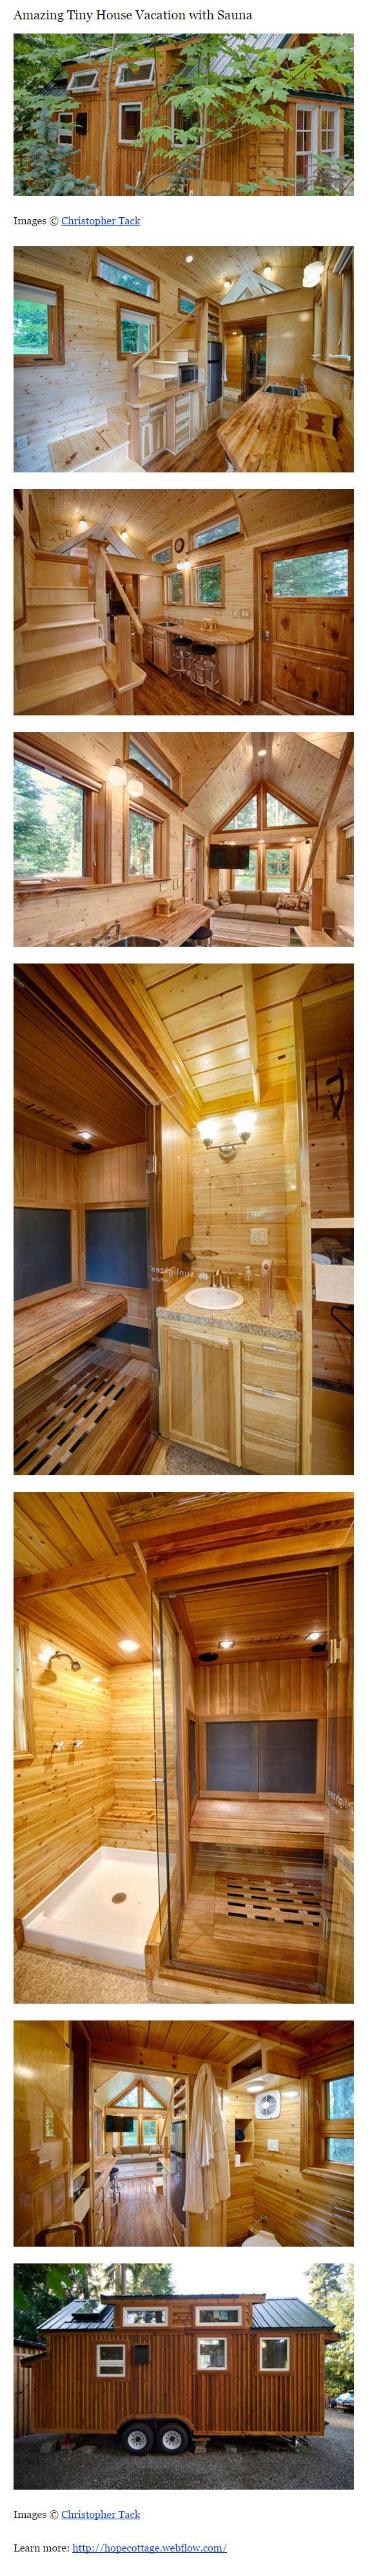 Amazing Tiny House Vacation with Sauna — http://tinyhousetalk.com/amazing-tiny-house-vacation-with-sauna/